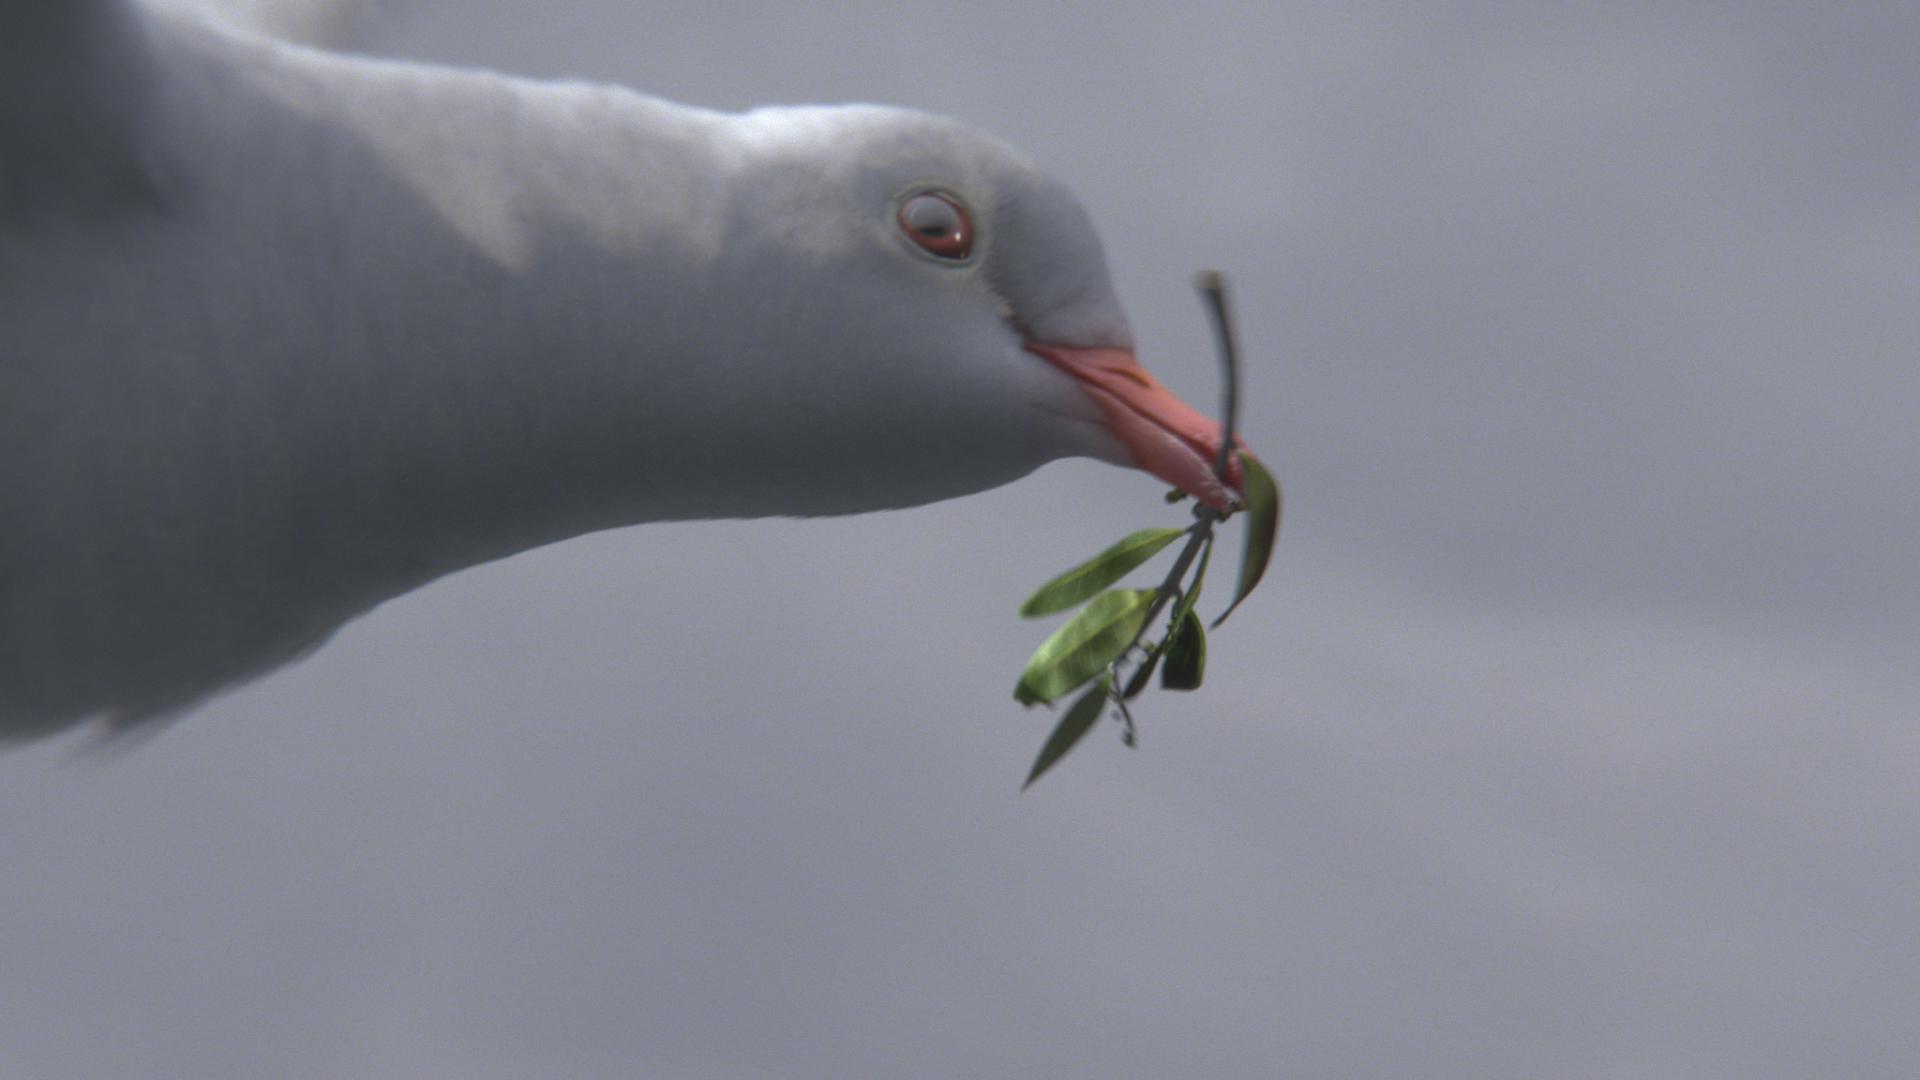 The Birds of Noah: Animation Reel